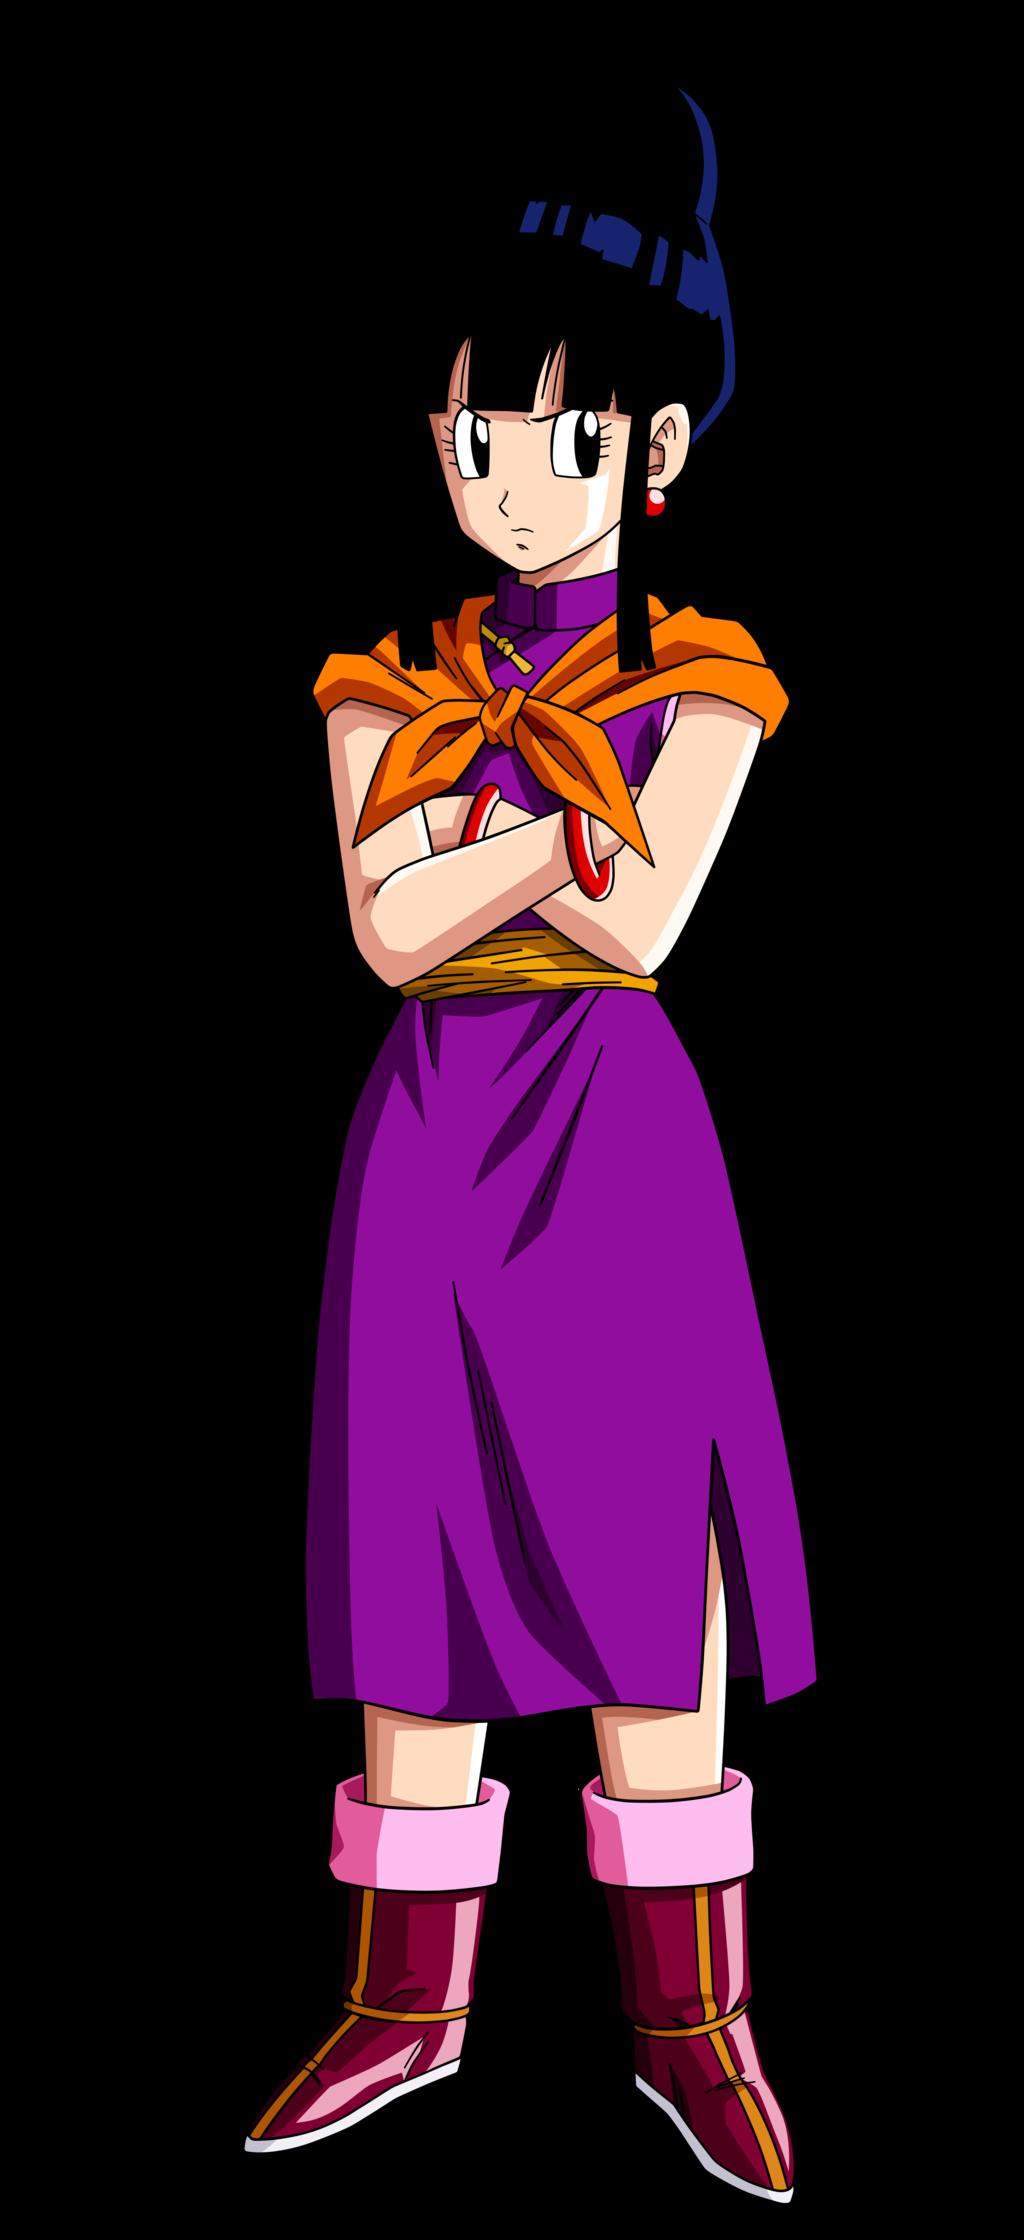 Chi-Chi (Dragon Ball Series) | Heroes unite Wikia | FANDOM